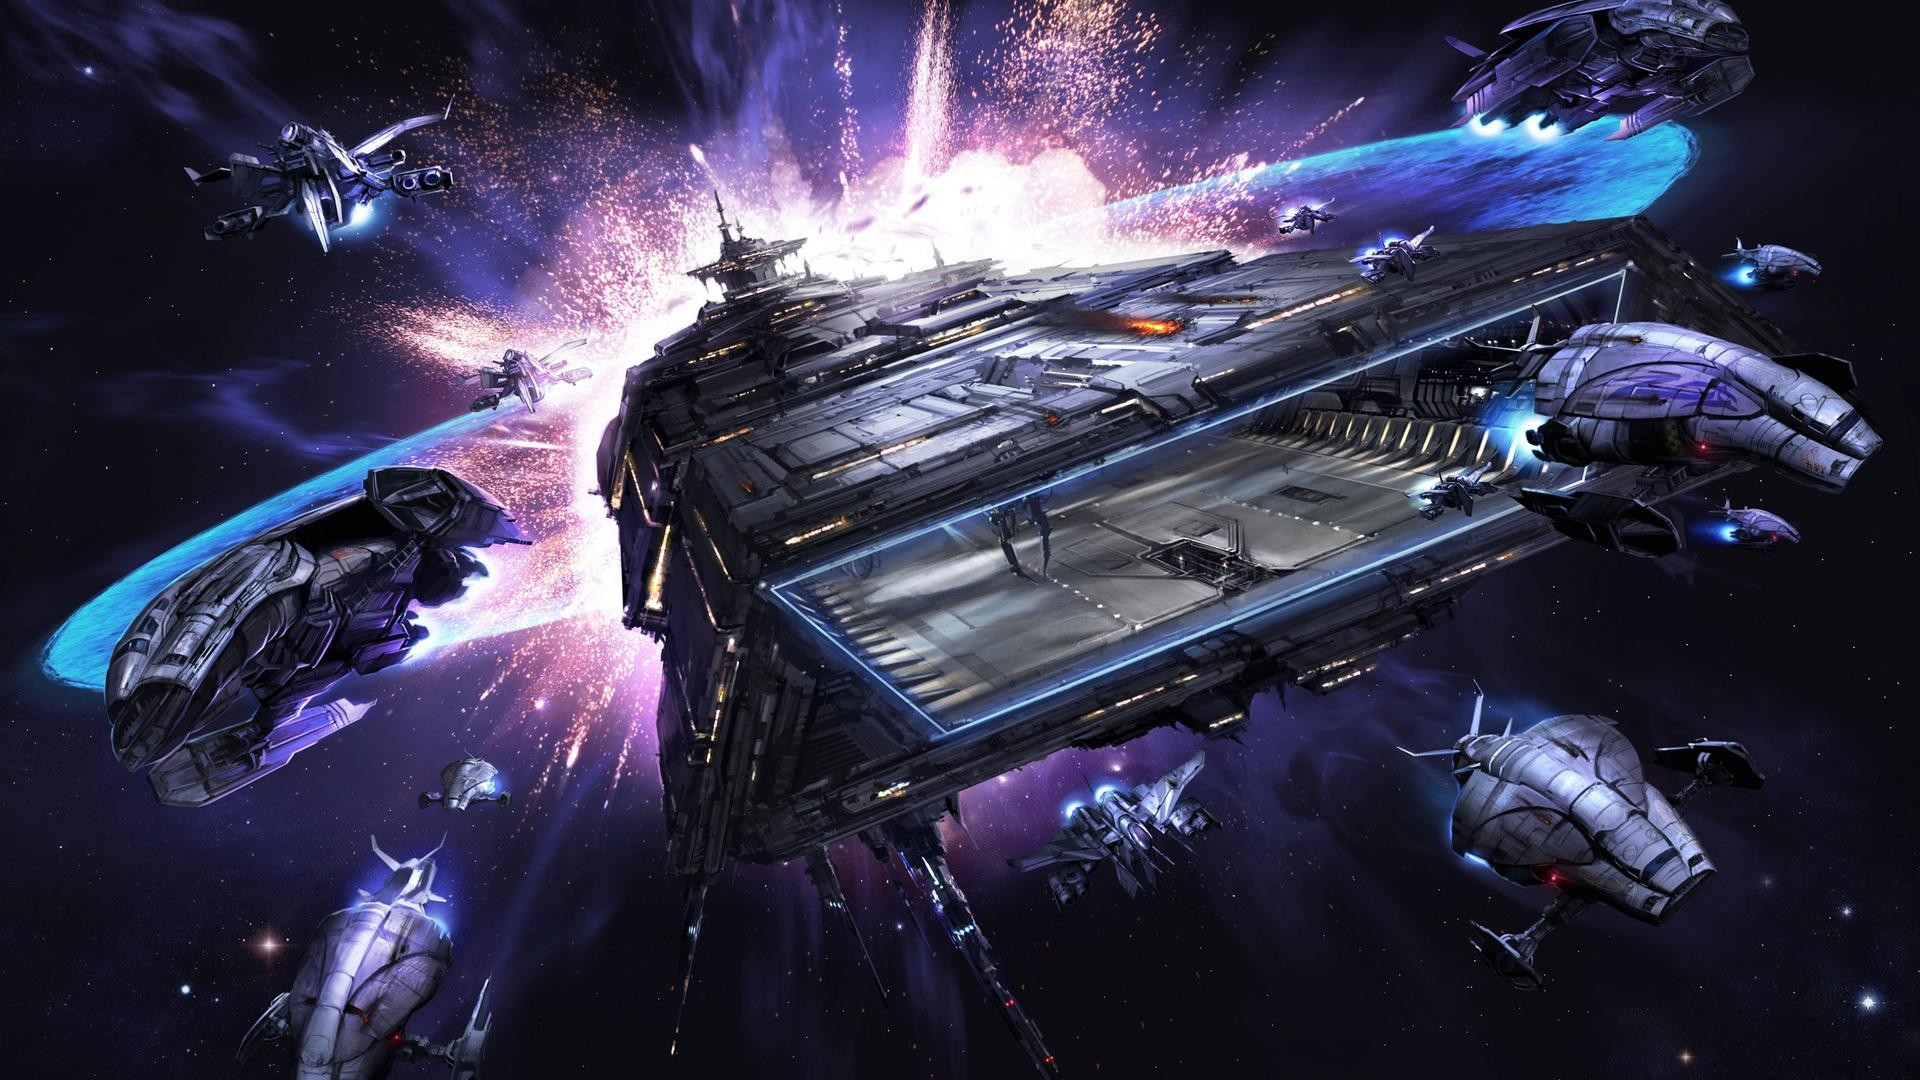 Spaceships X Rebirth space spaceship wallpaper 1920x1080 1920x1080